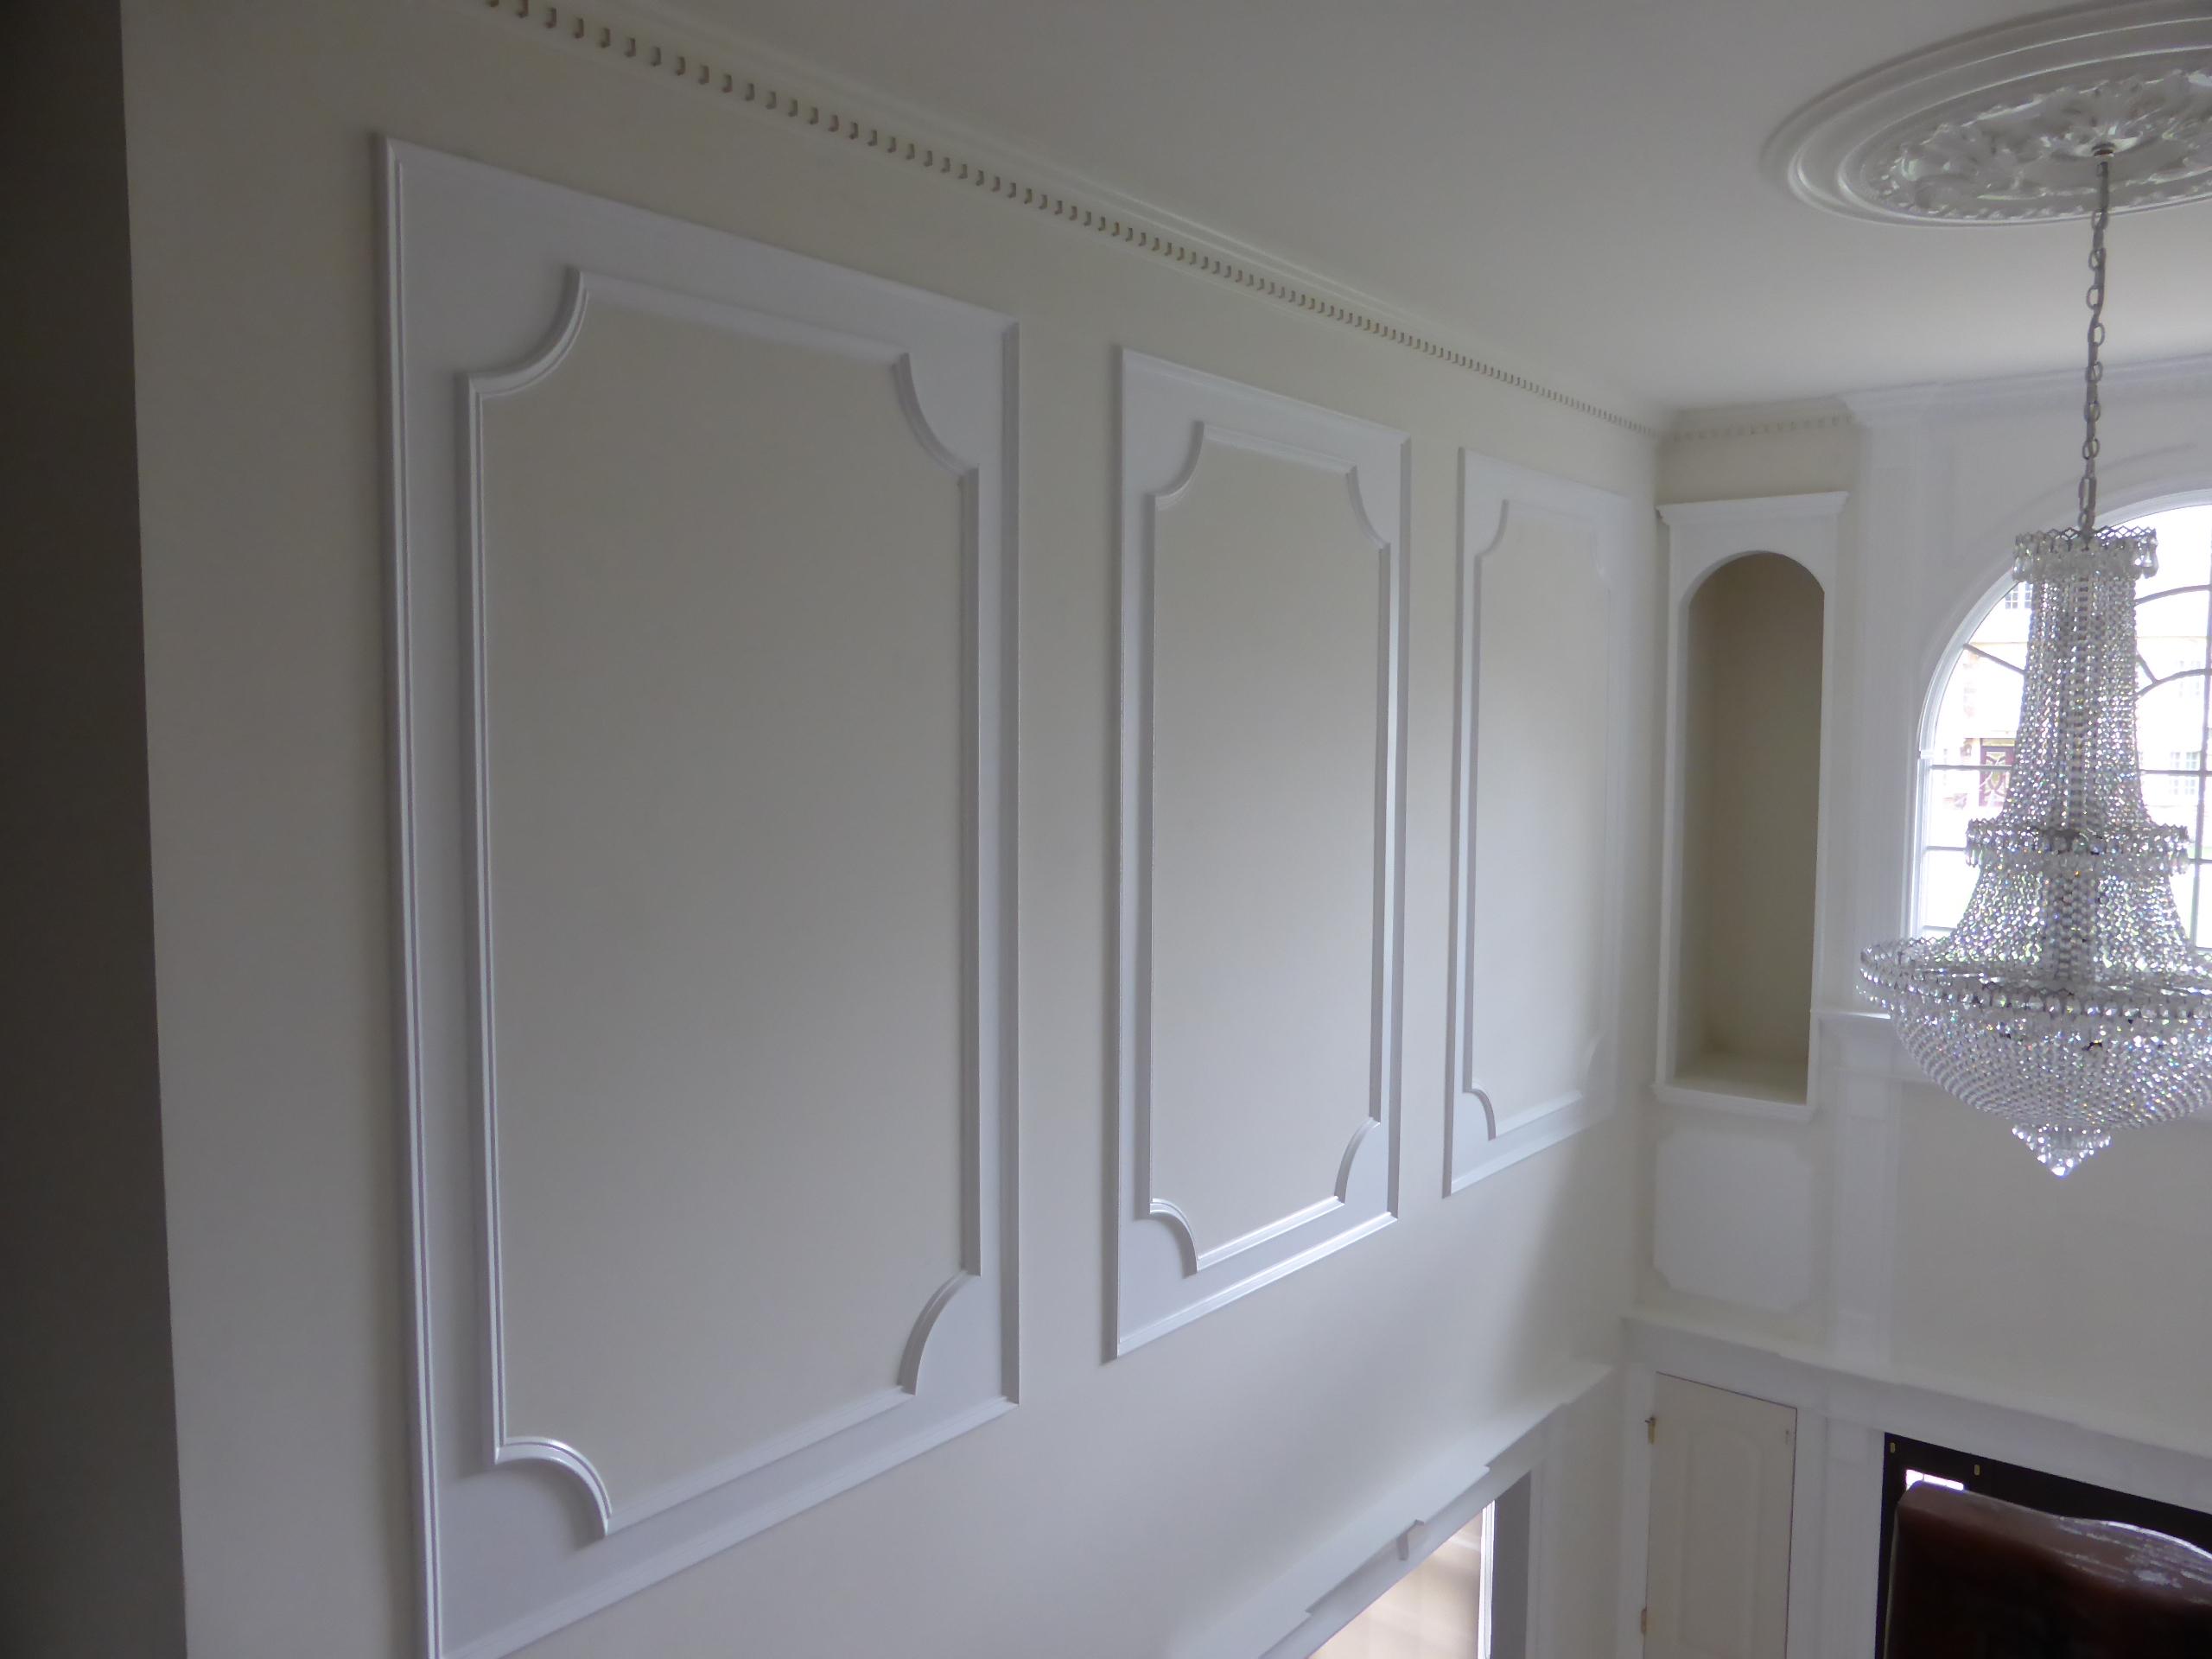 Wall Frames Crown Molding Nj Wall Frames Expert